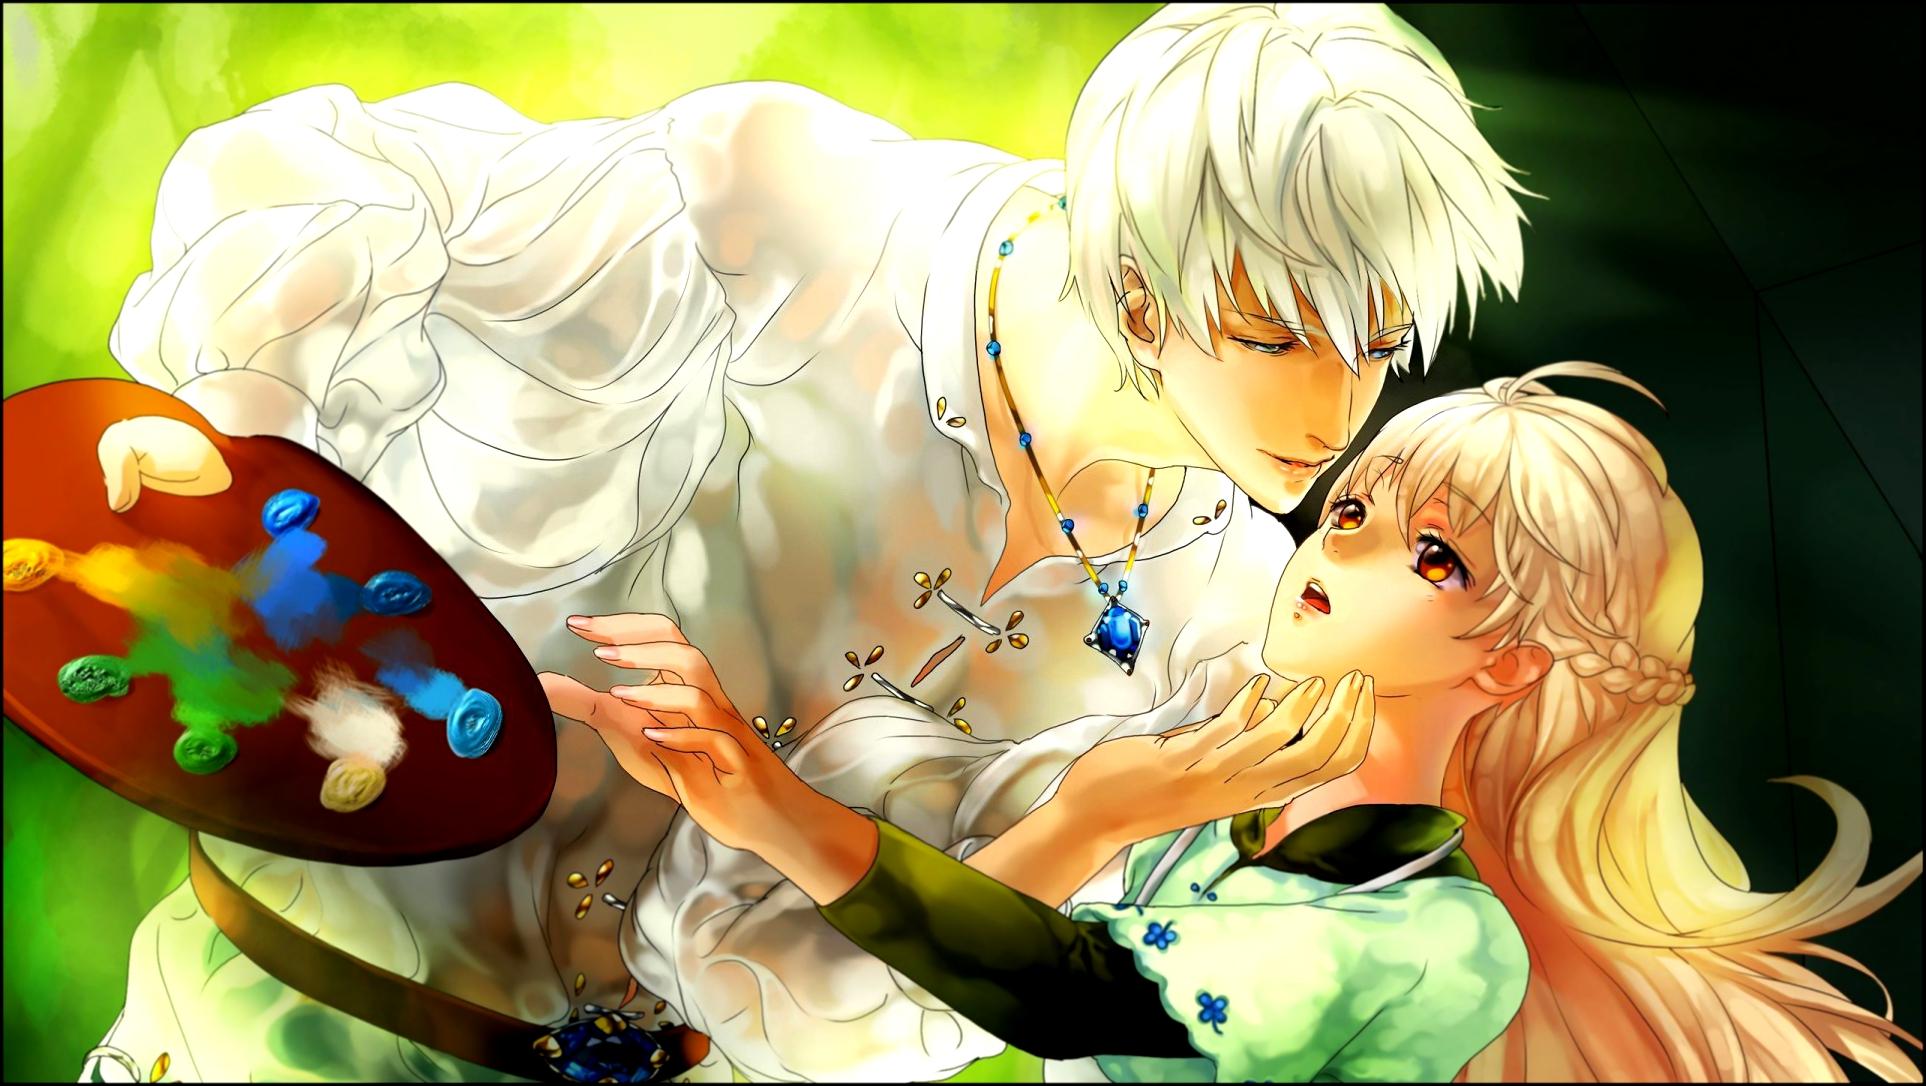 Sad Boy And Girl Wallpaper Full Hd Download Free Cute Anime Couple Backgrounds Pixelstalk Net